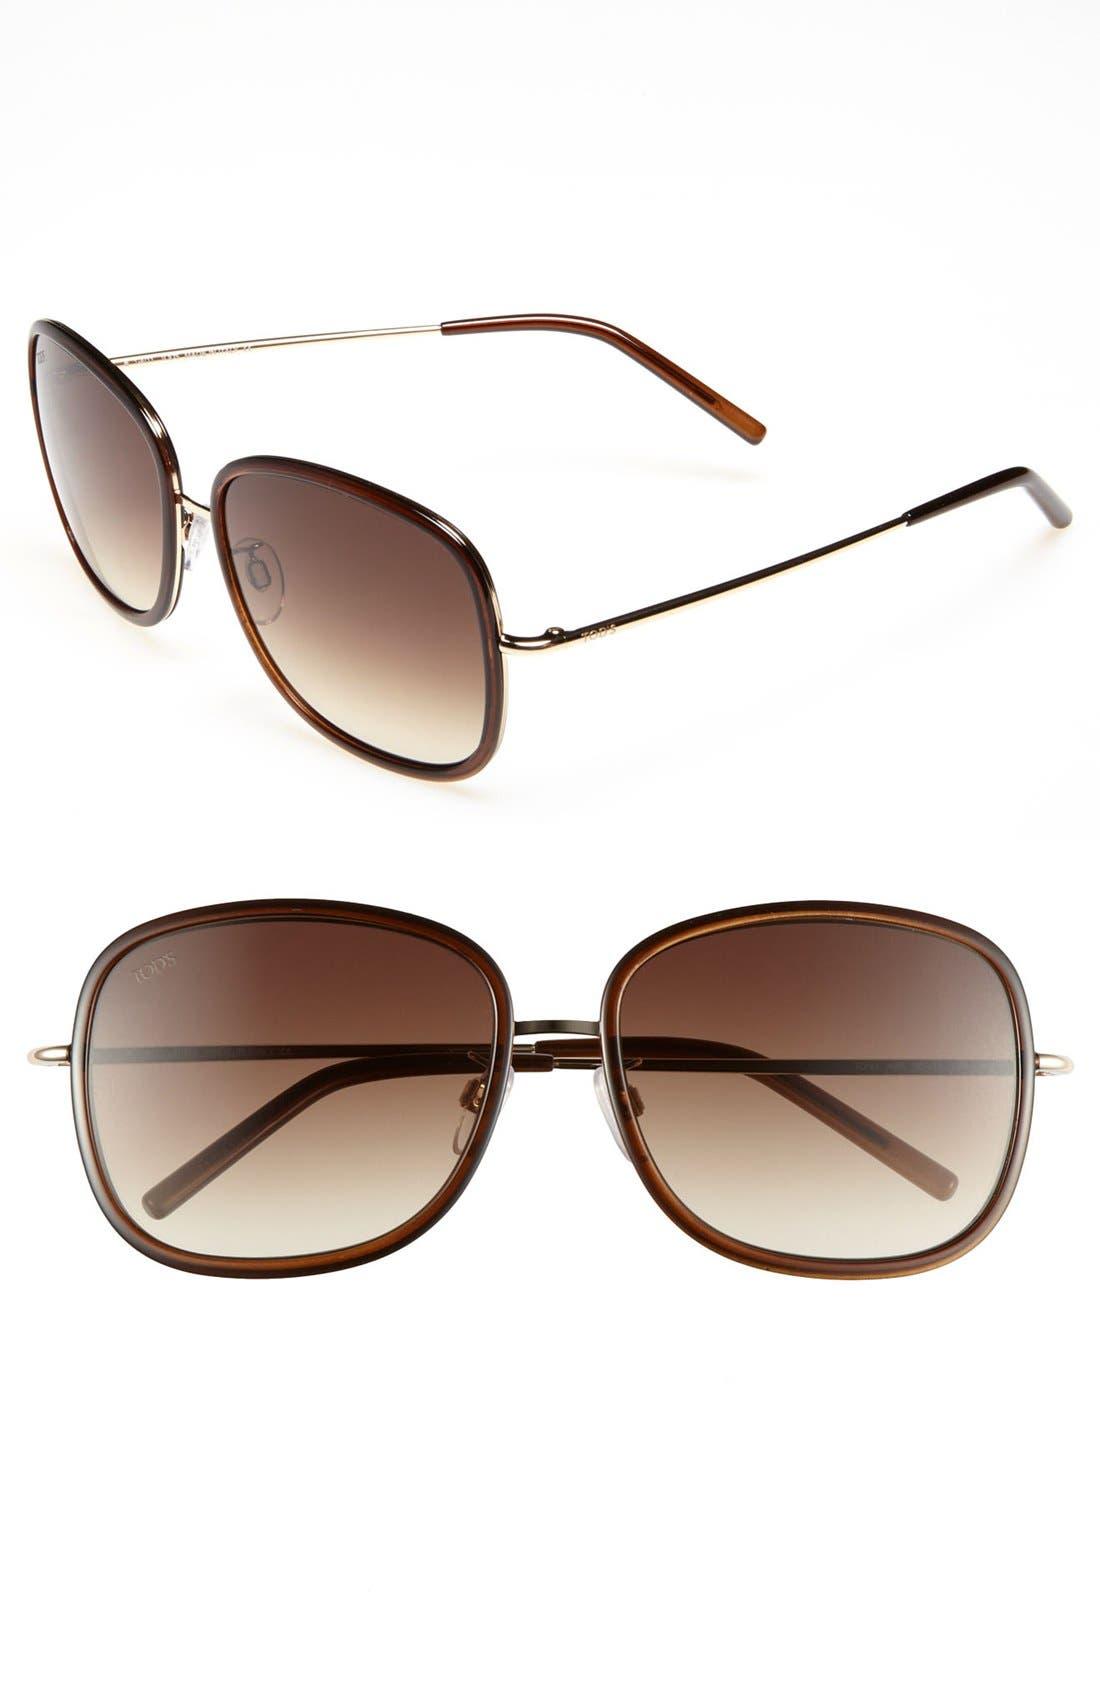 Main Image - Tod's 'Sung' 58mm Metal Aviator Sunglasses